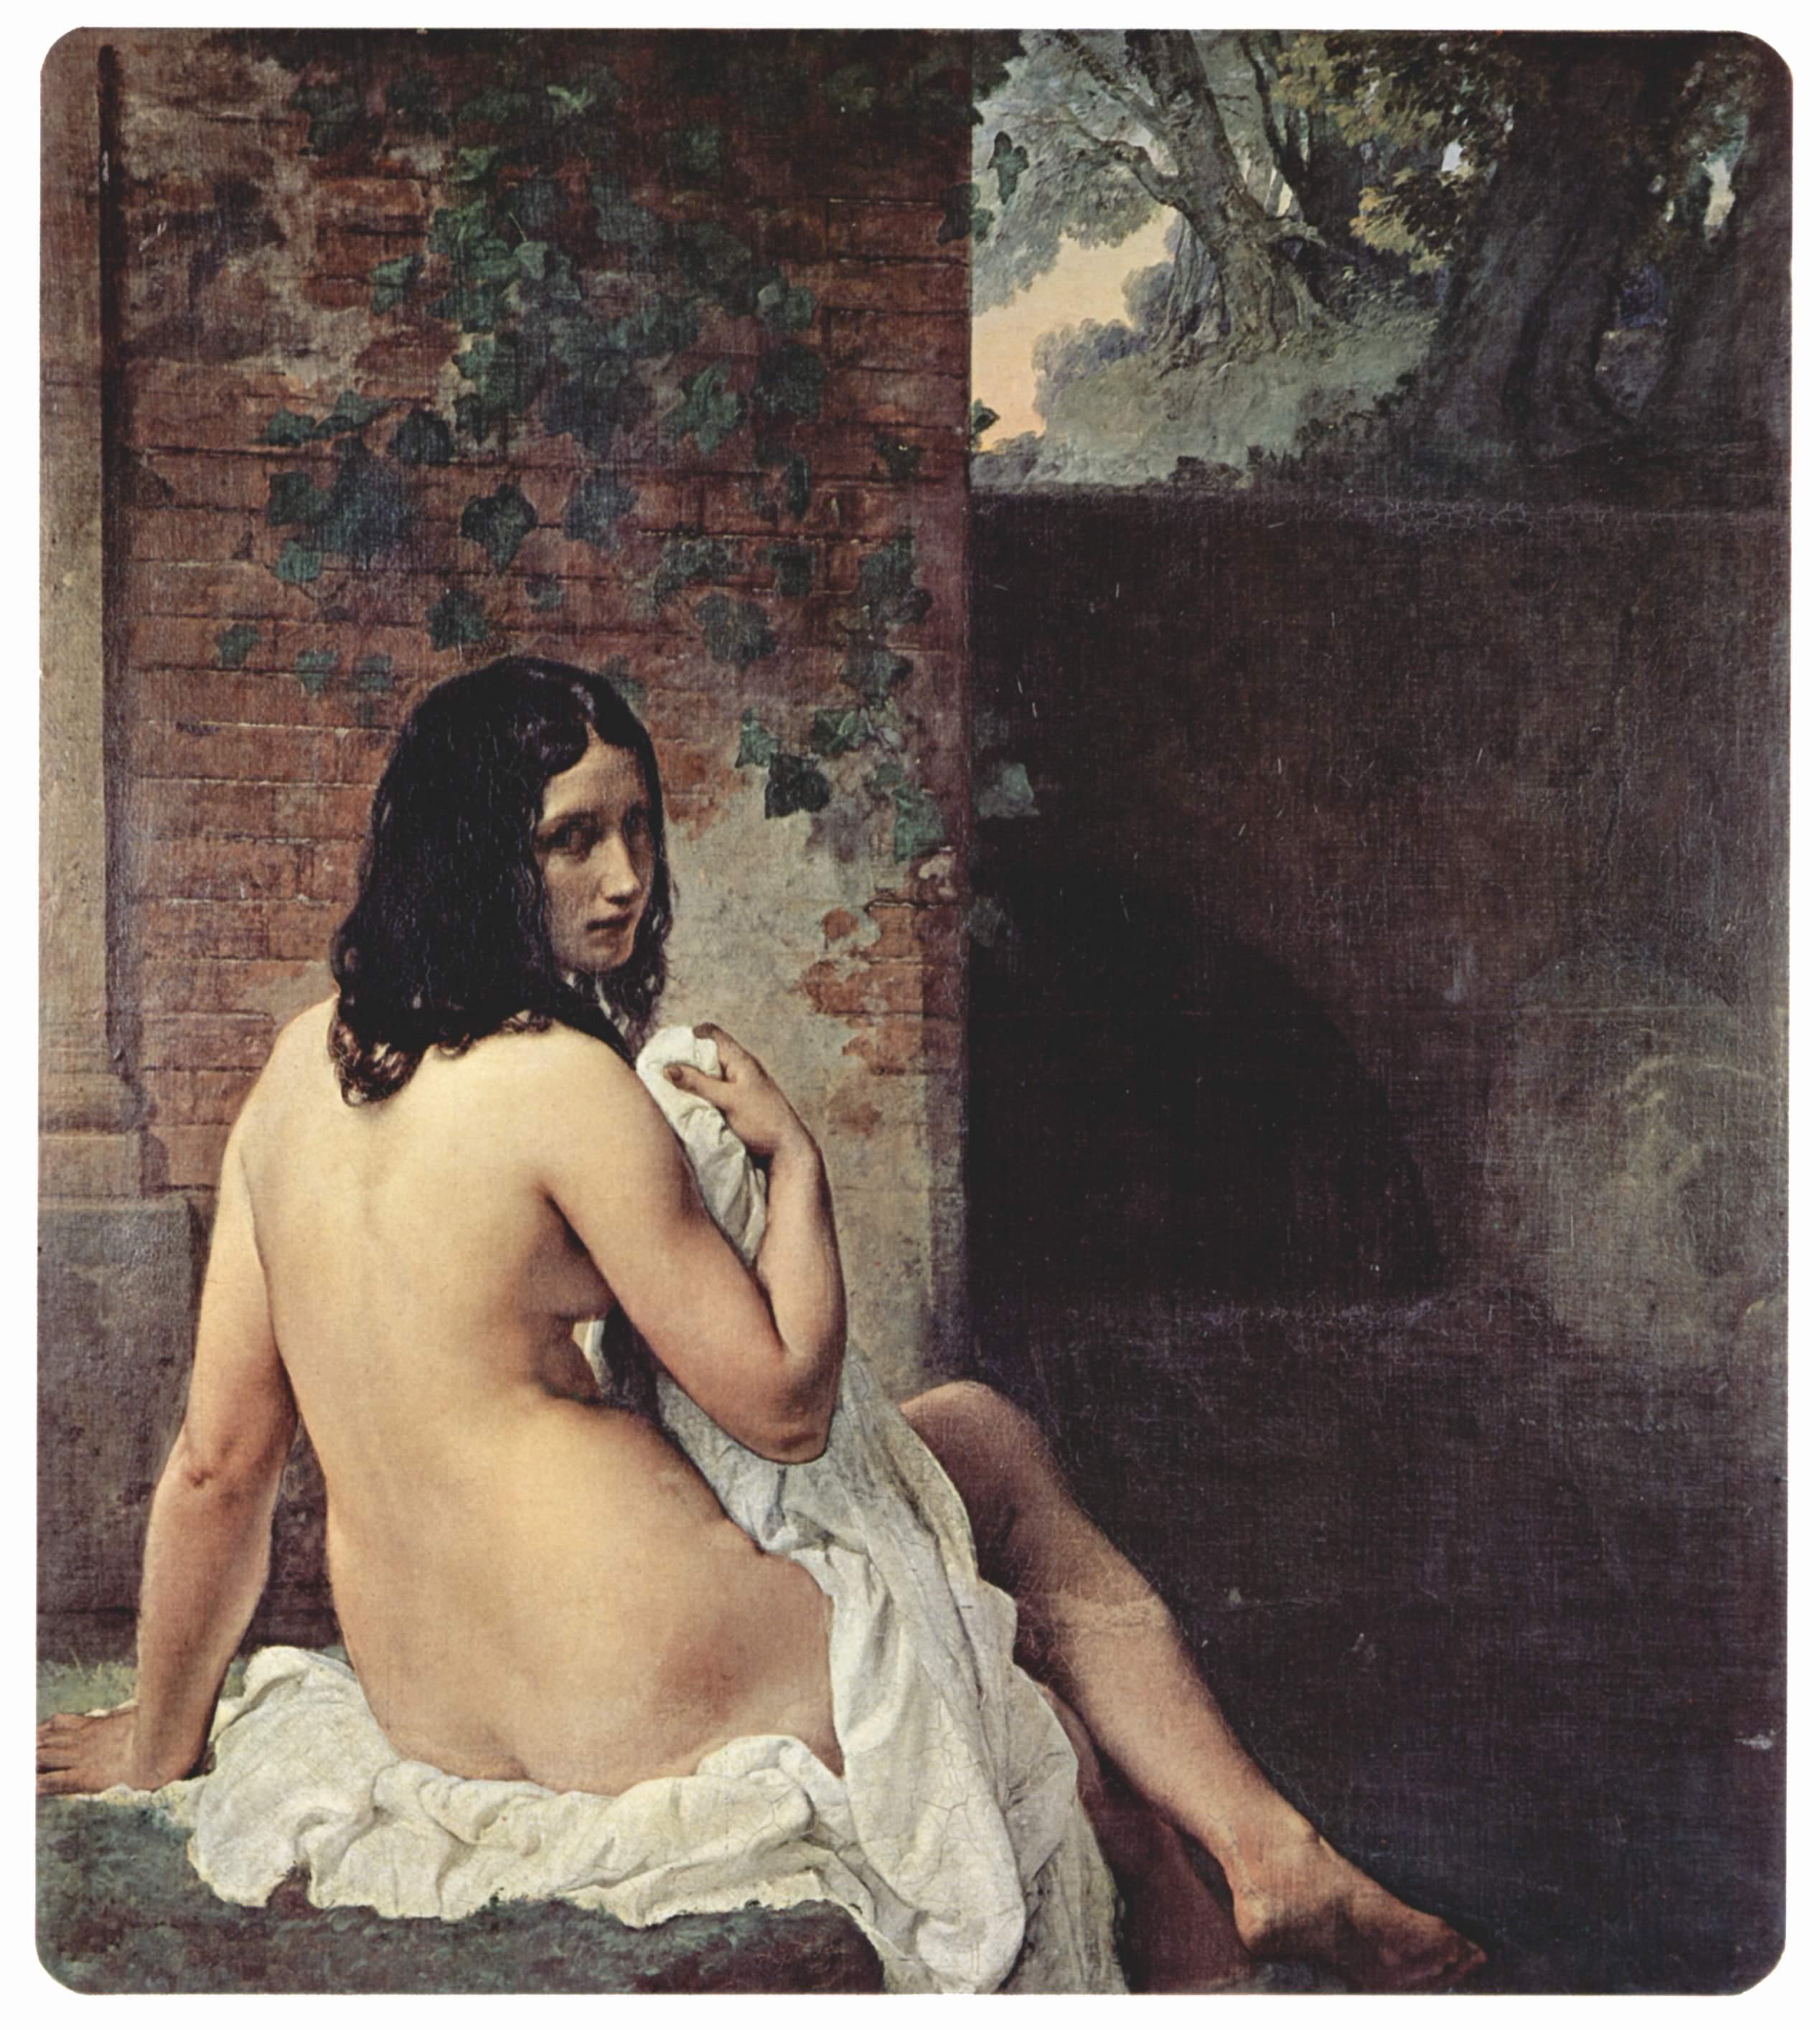 back view of a bather 1859 ... international Three months ago, austin based bikinis arlington Bikinis